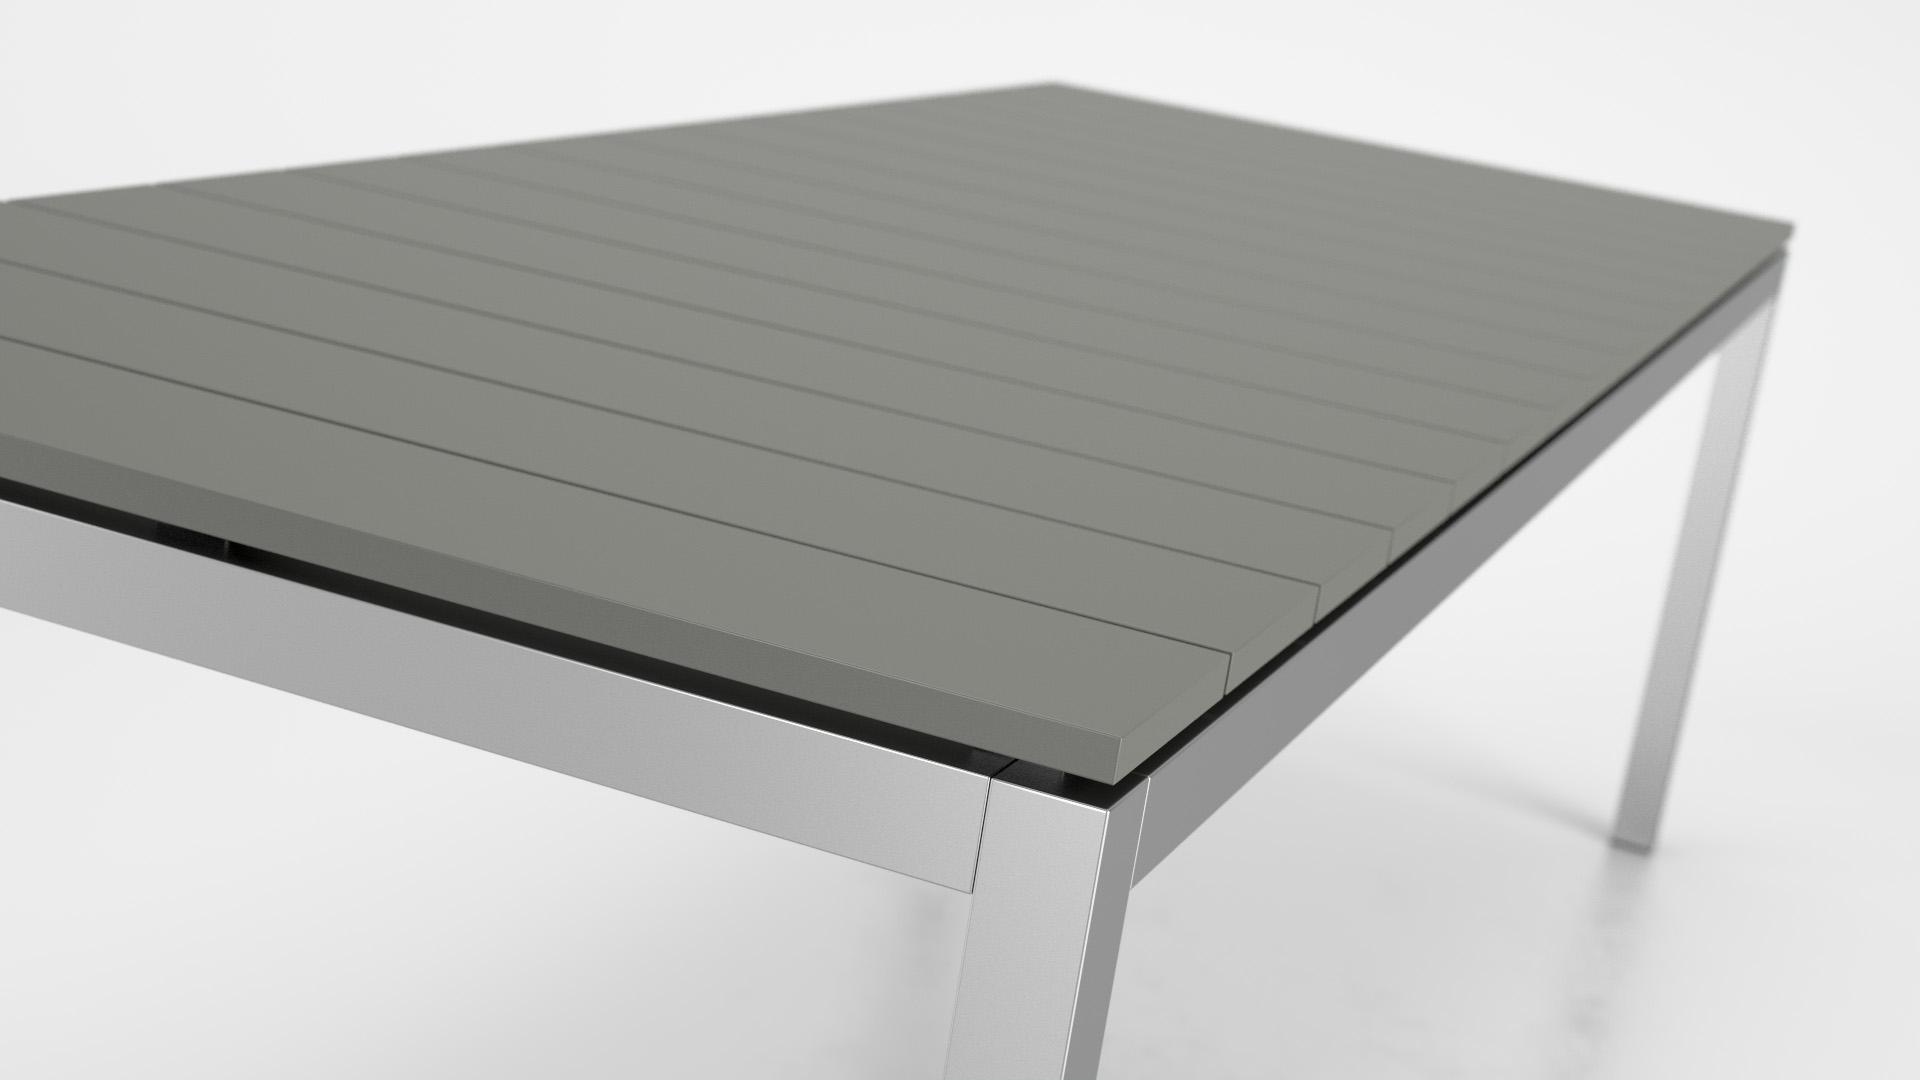 Tribu_NatalTechno_Table_WhiteSet_01_0003